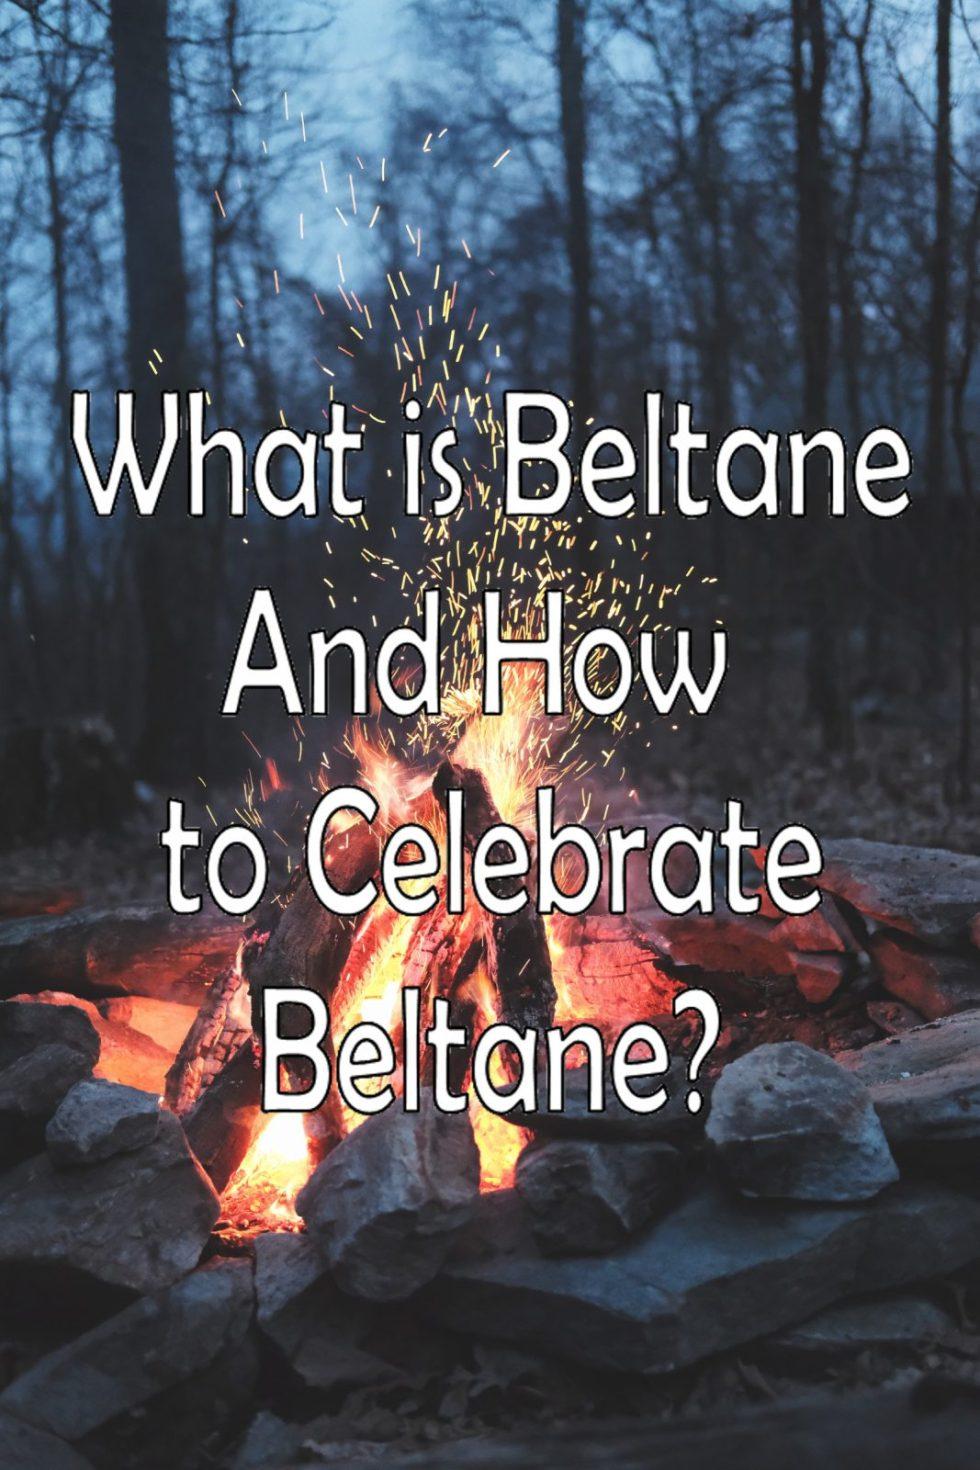 About Beltane 5th sabbat